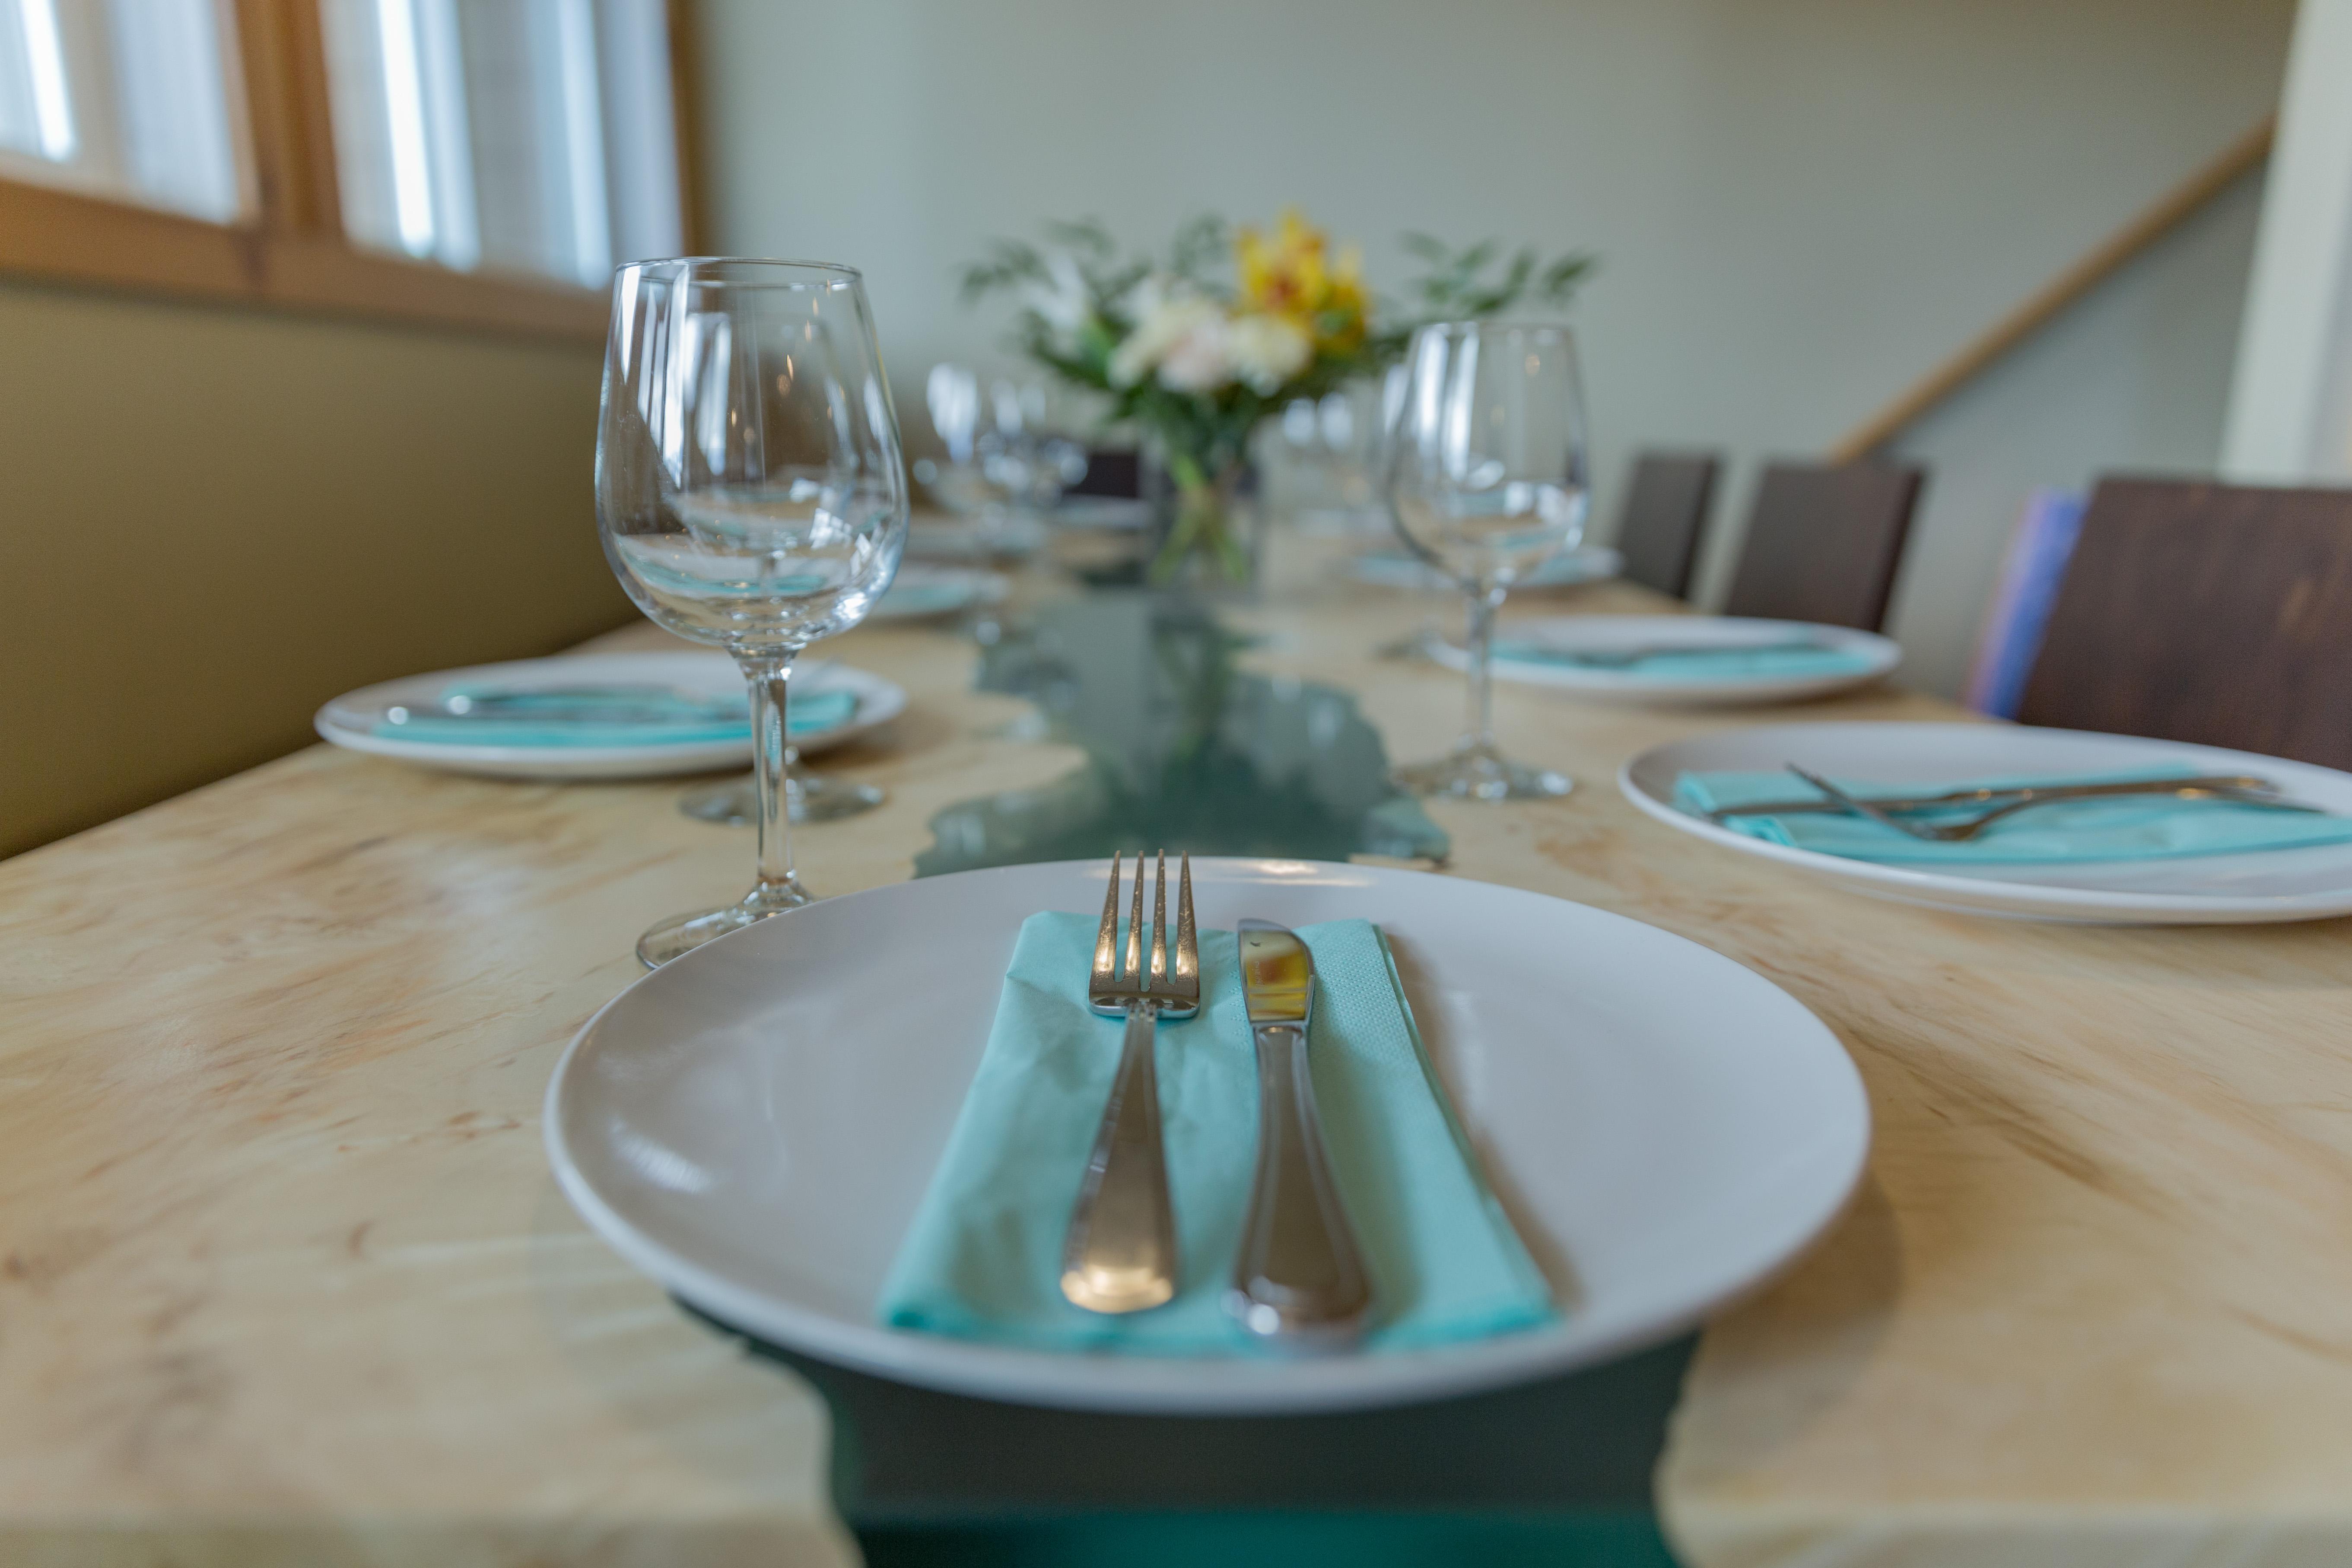 KR410 NL Table Set1